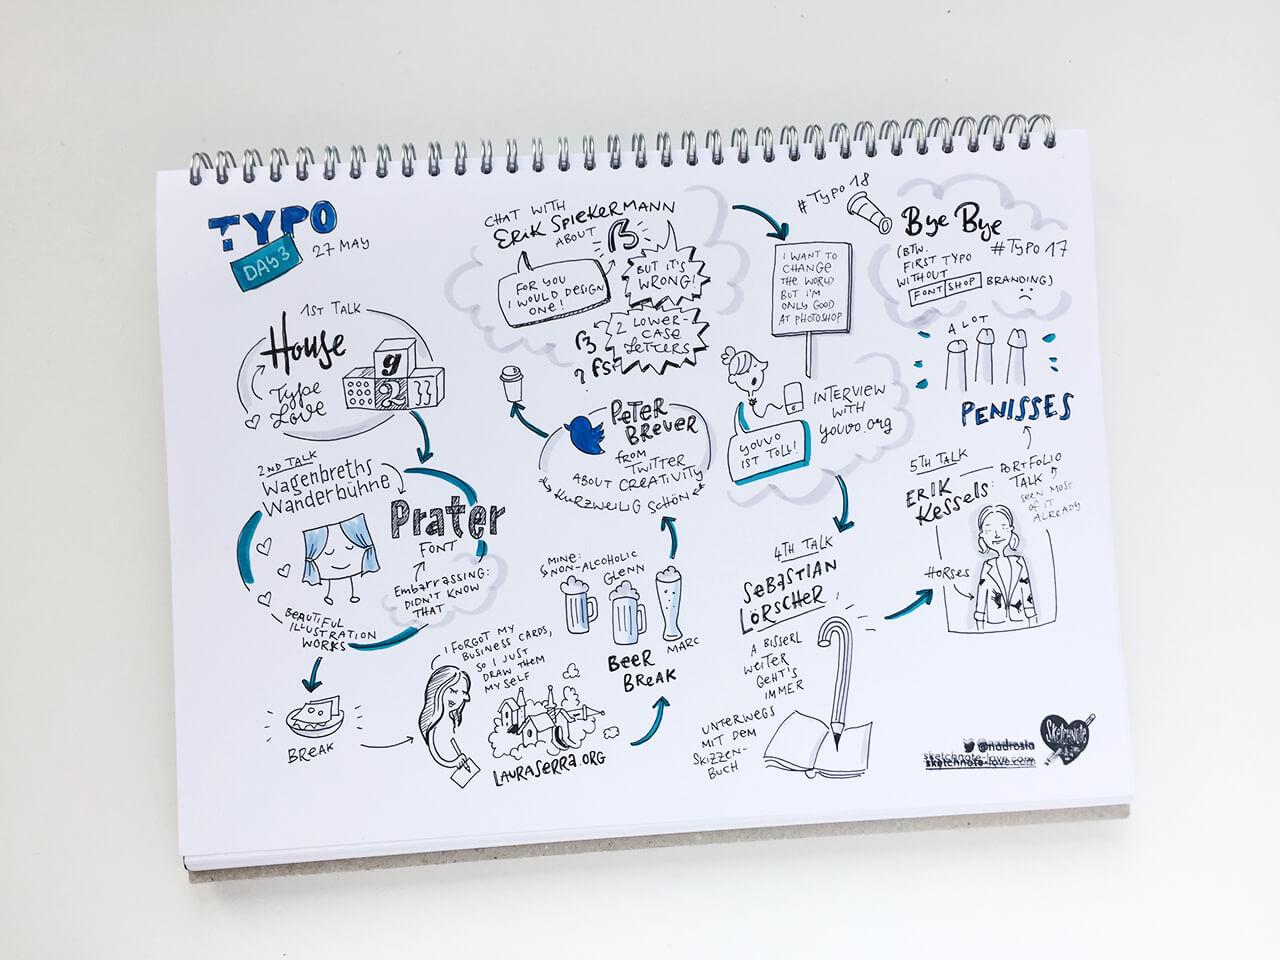 Sketchnotes TYPO 2017 recap Day 3